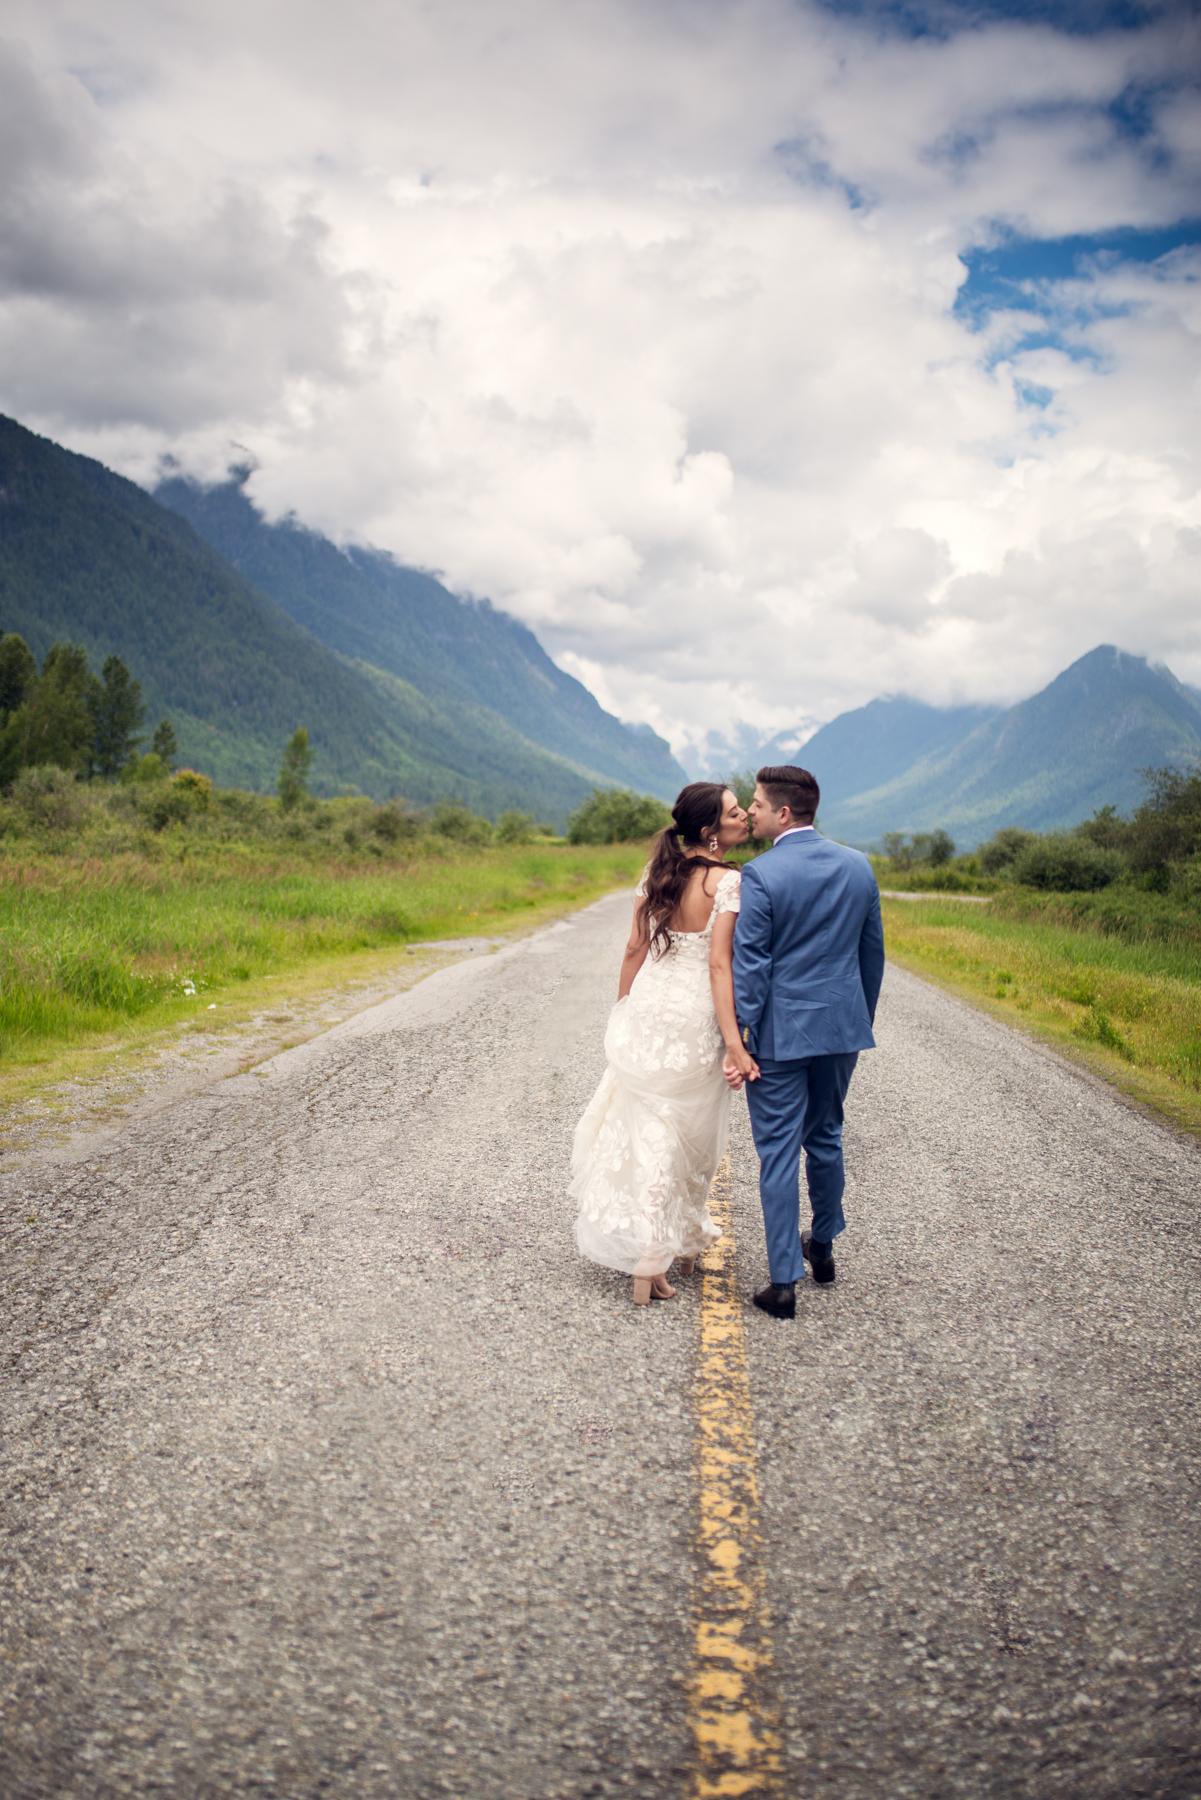 dp-wedding-web-016